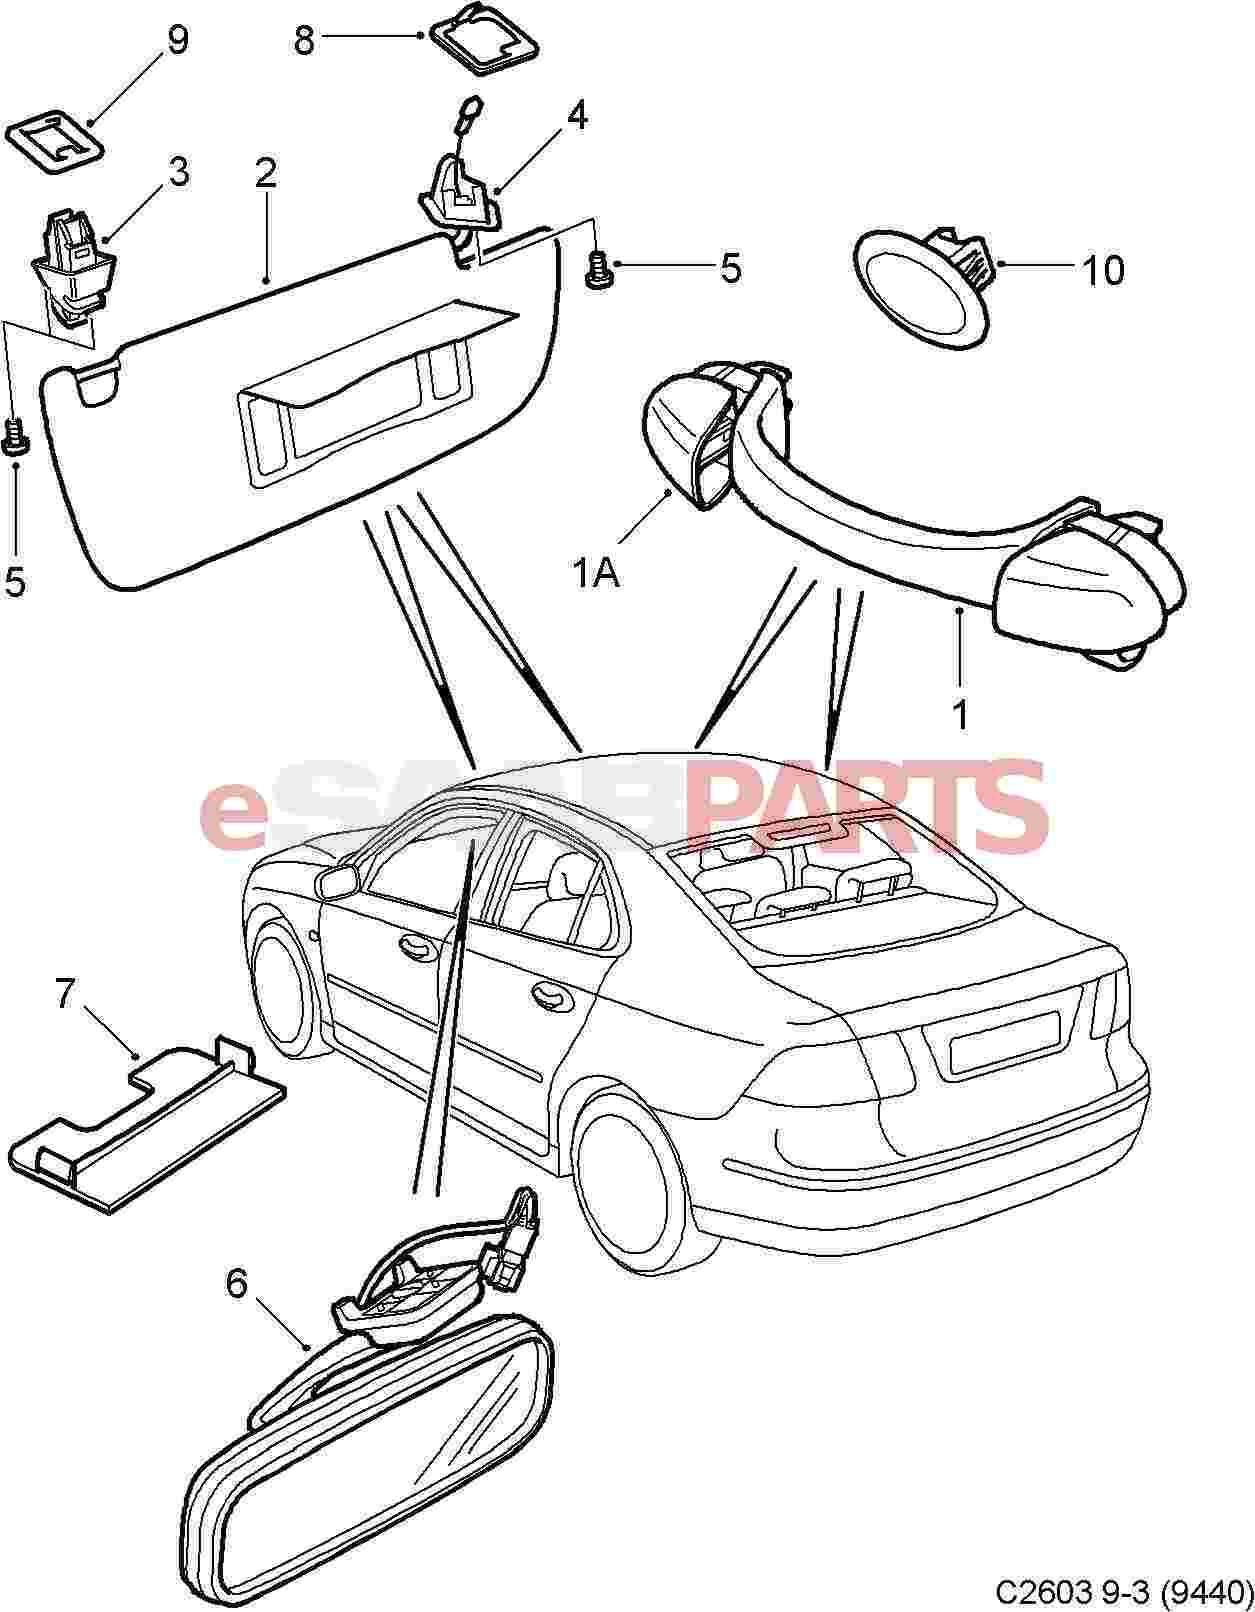 saab 9 3 parts diagram interior  saab  auto parts catalog